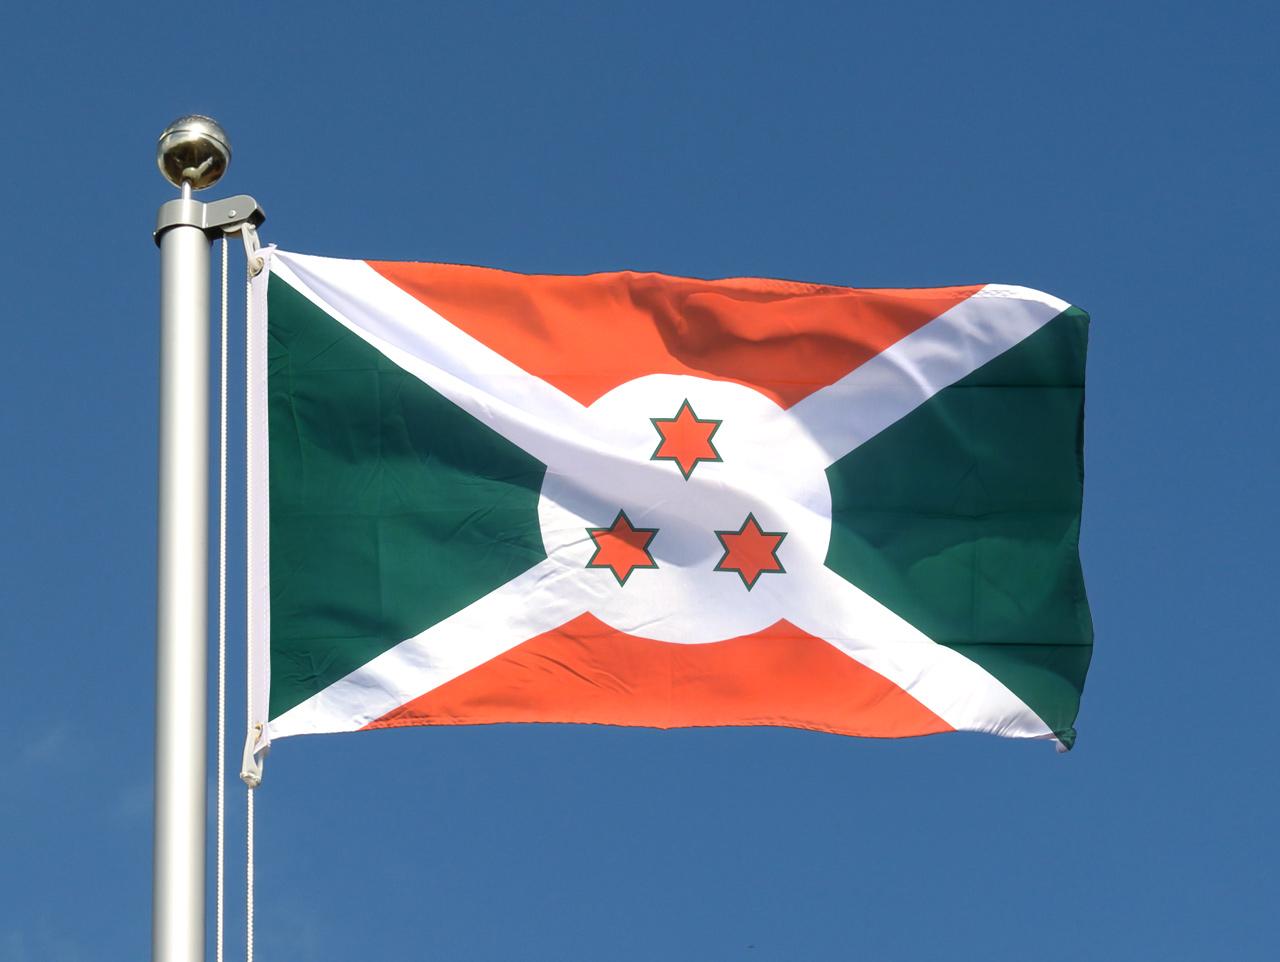 Cheap Burundi Flag - 2x3 ft - Royal-Flags